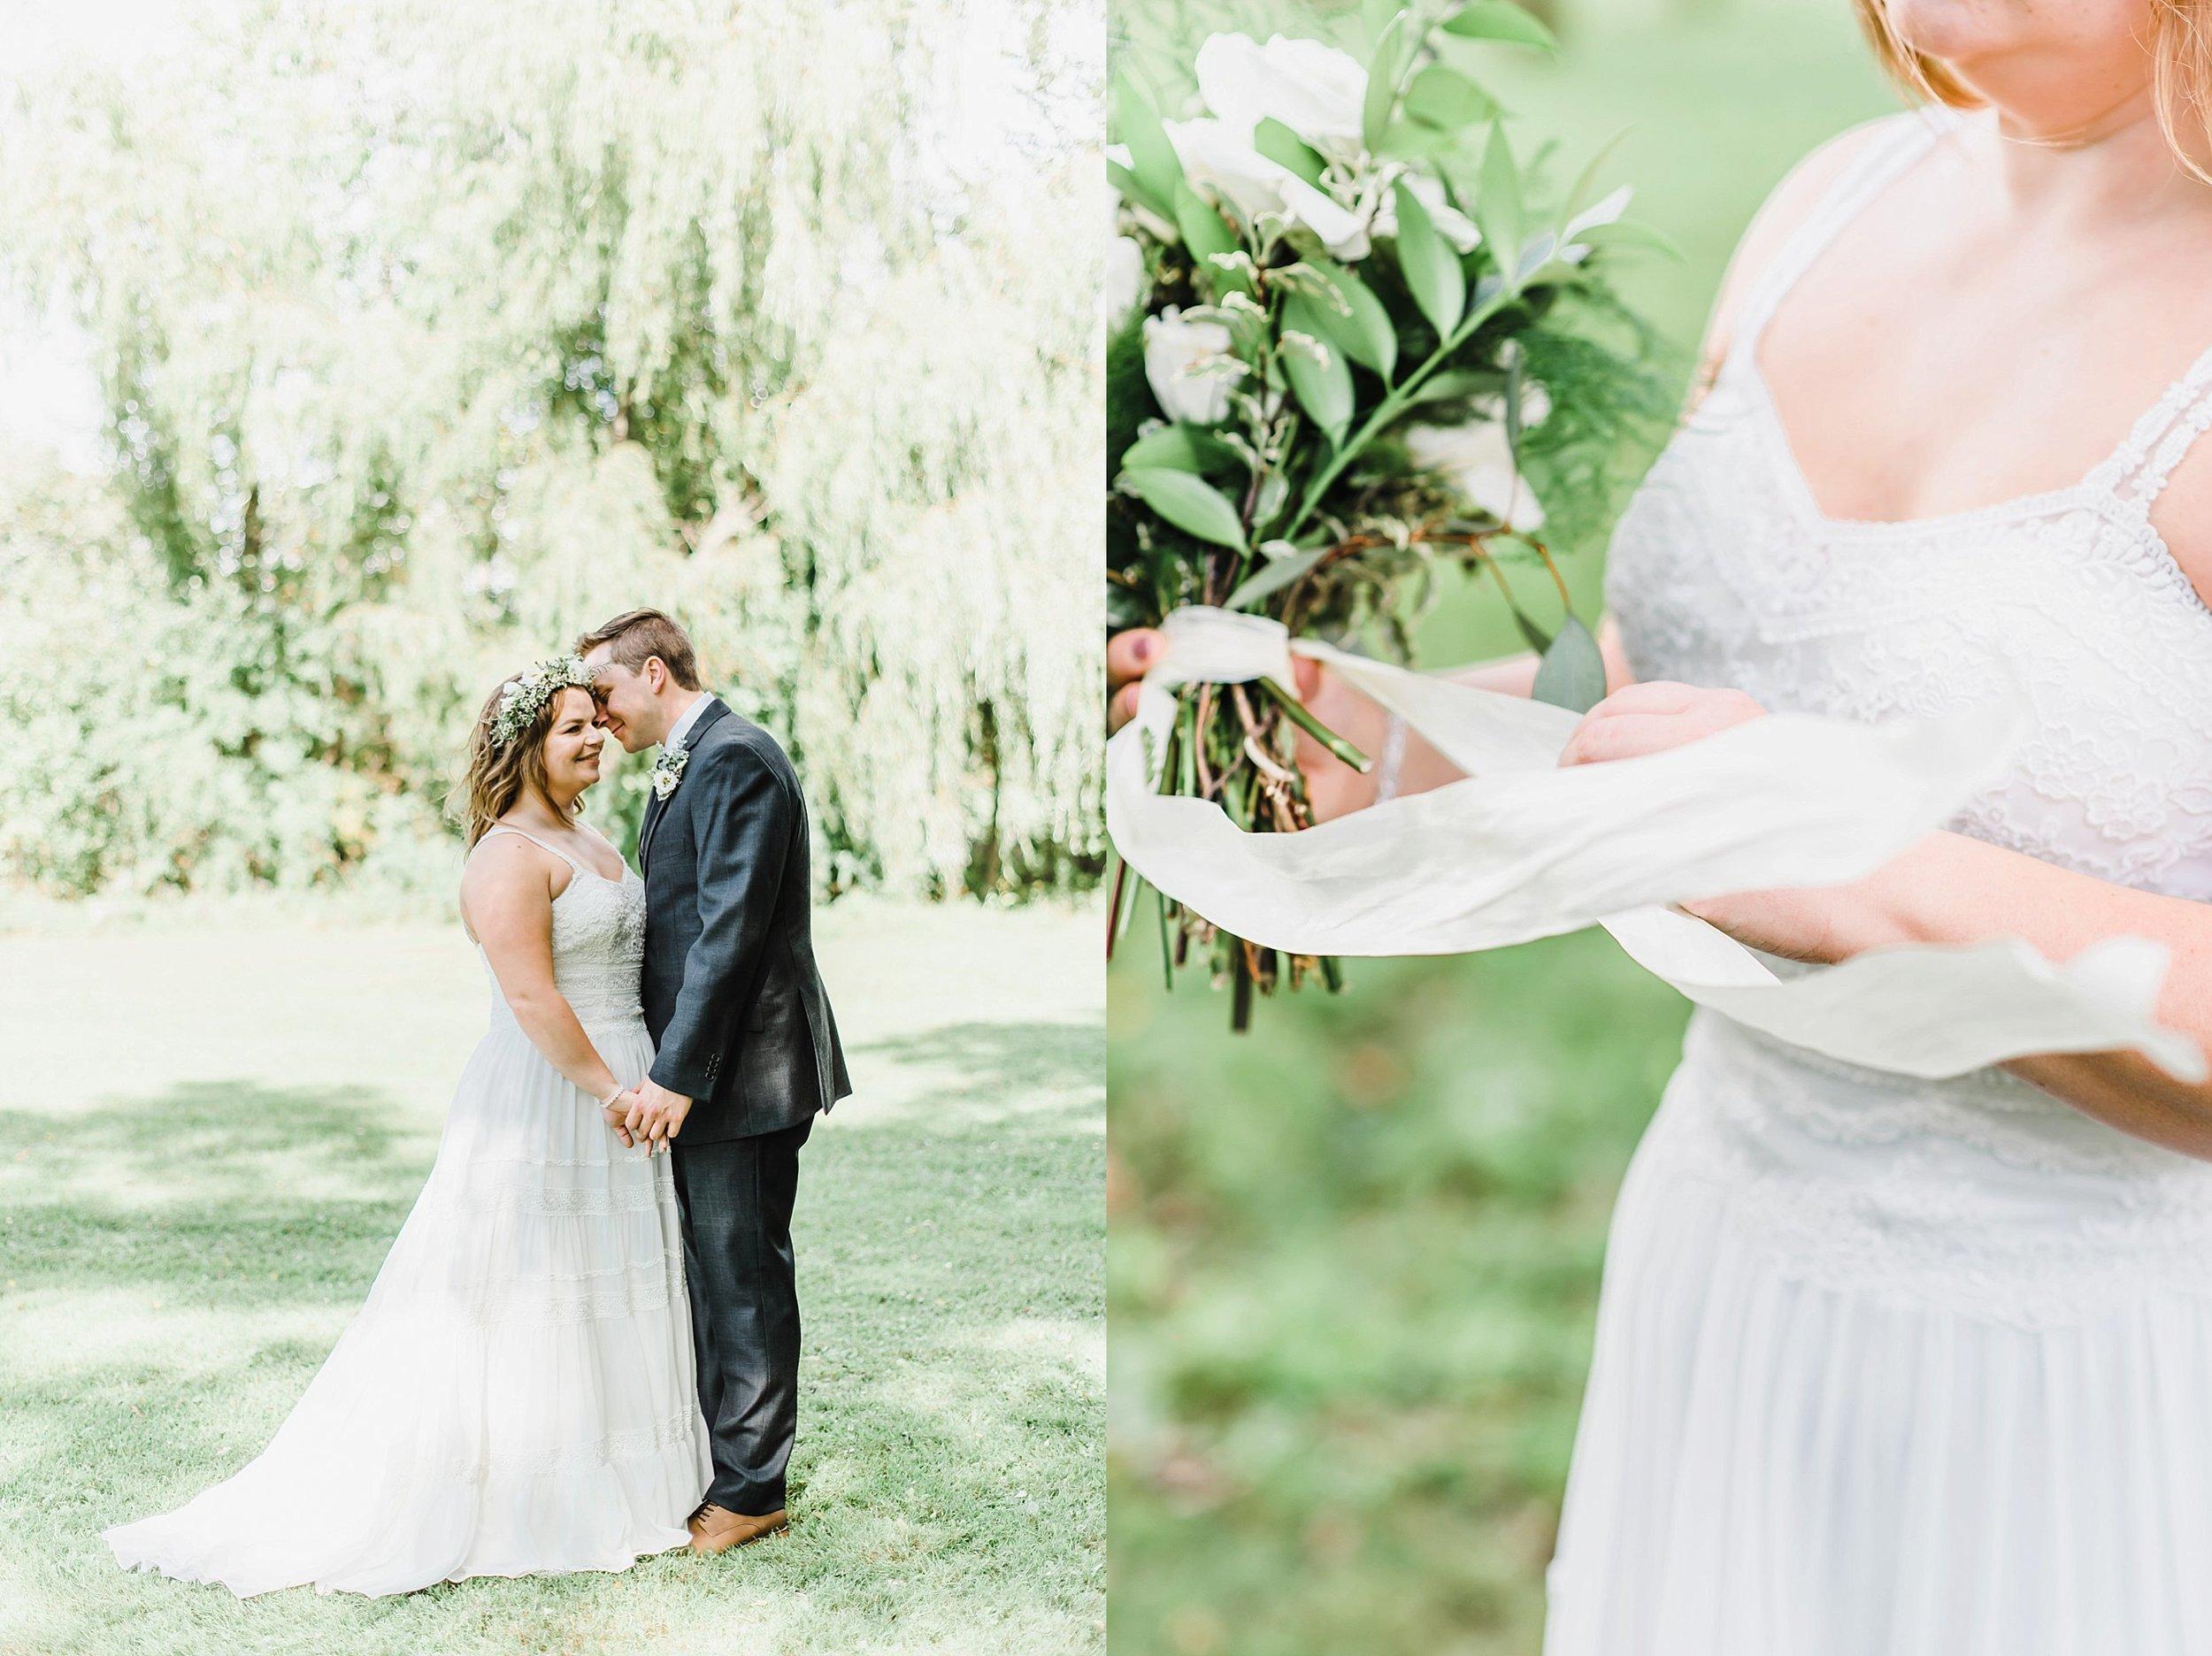 light airy indie fine art ottawa wedding photographer | Ali and Batoul Photography_1121.jpg